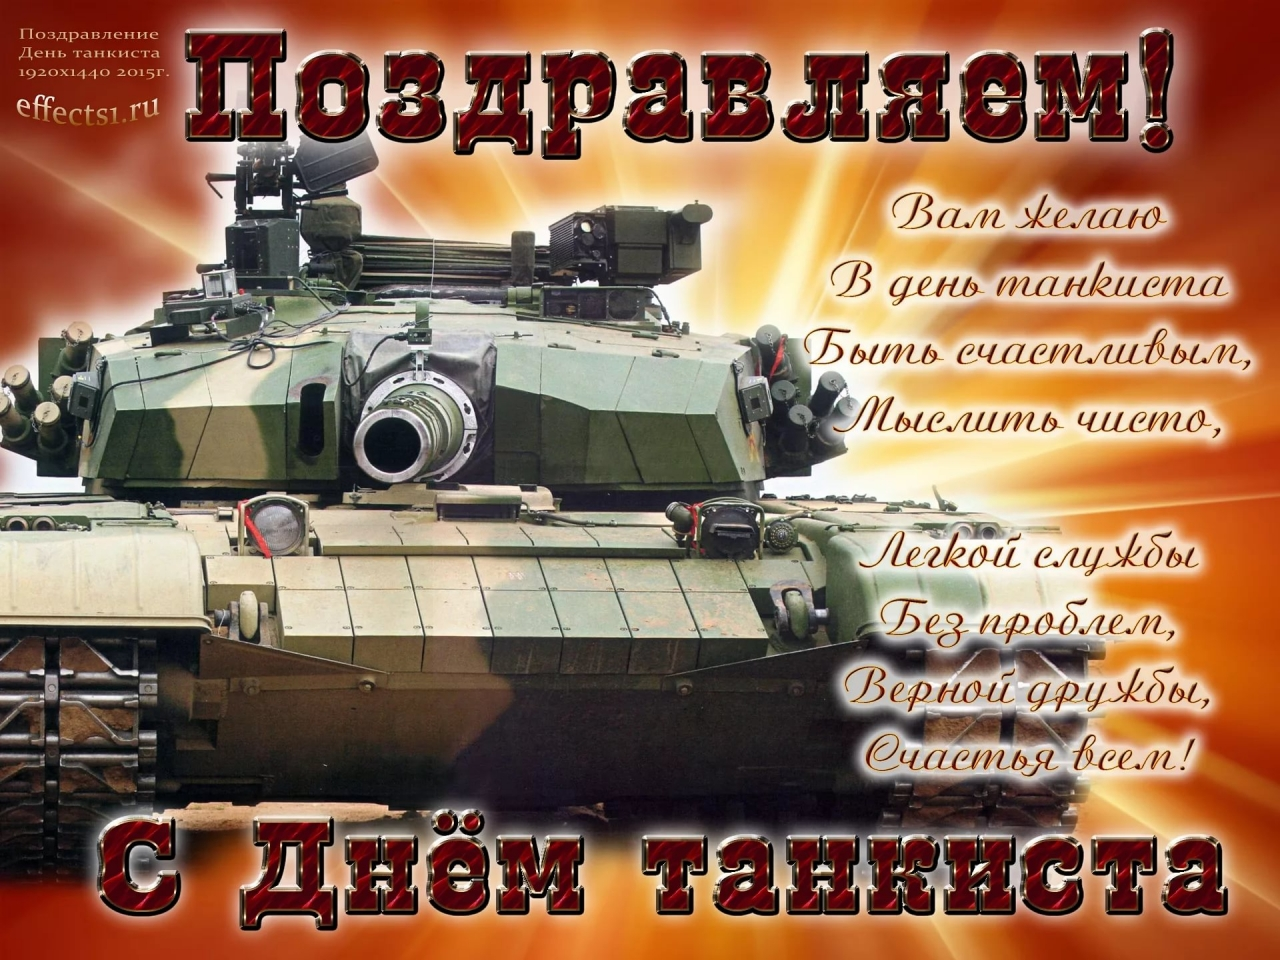 картинки с праздником танкиста 9 сентября отметки